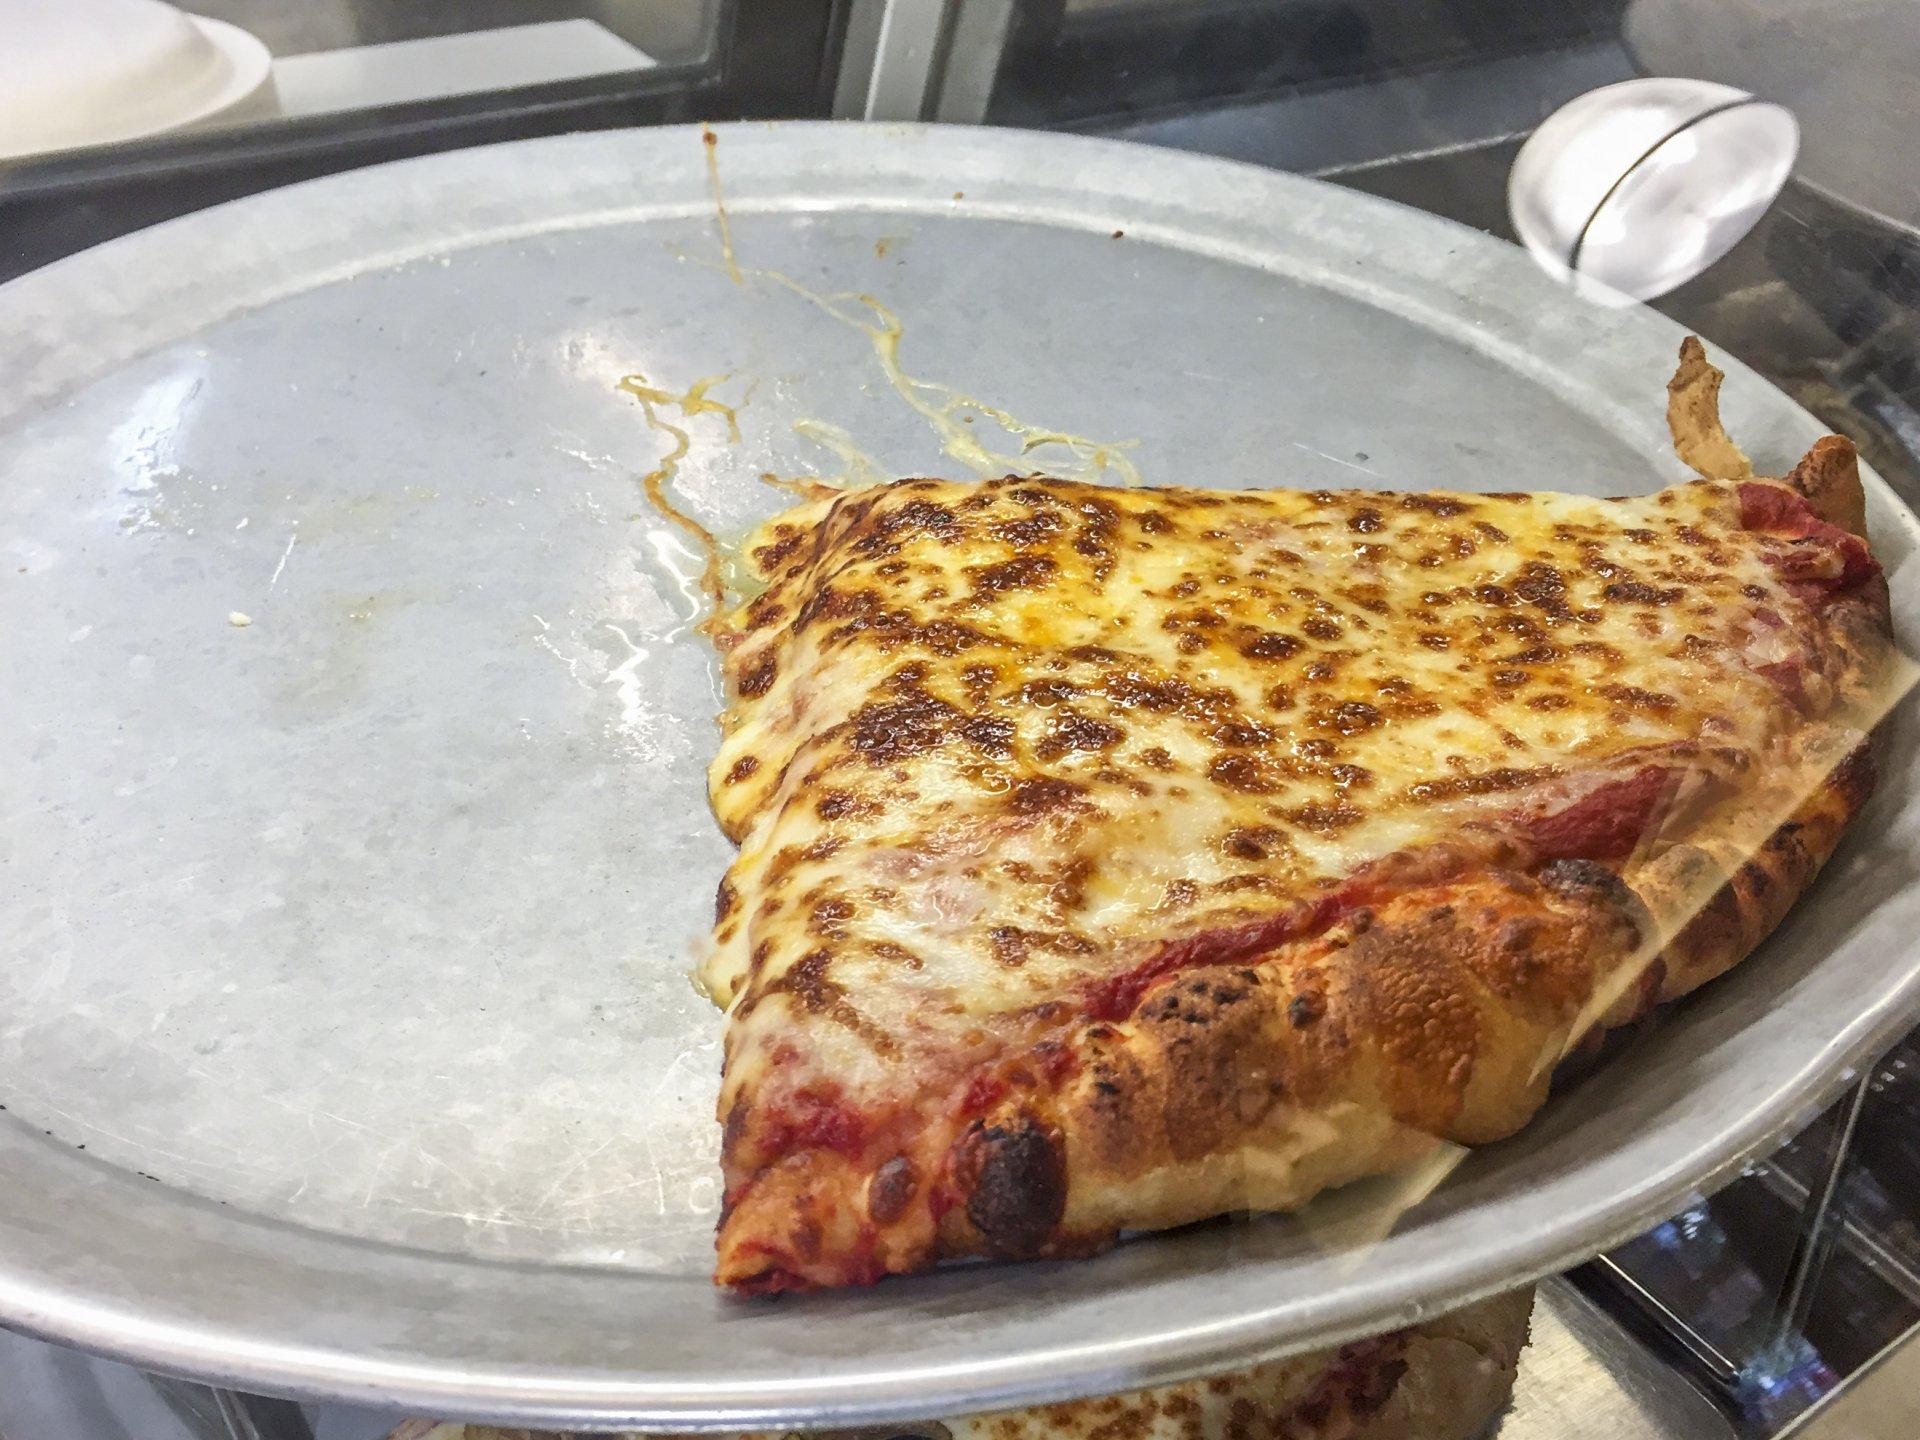 Cheese pizza | Iridian Casarez